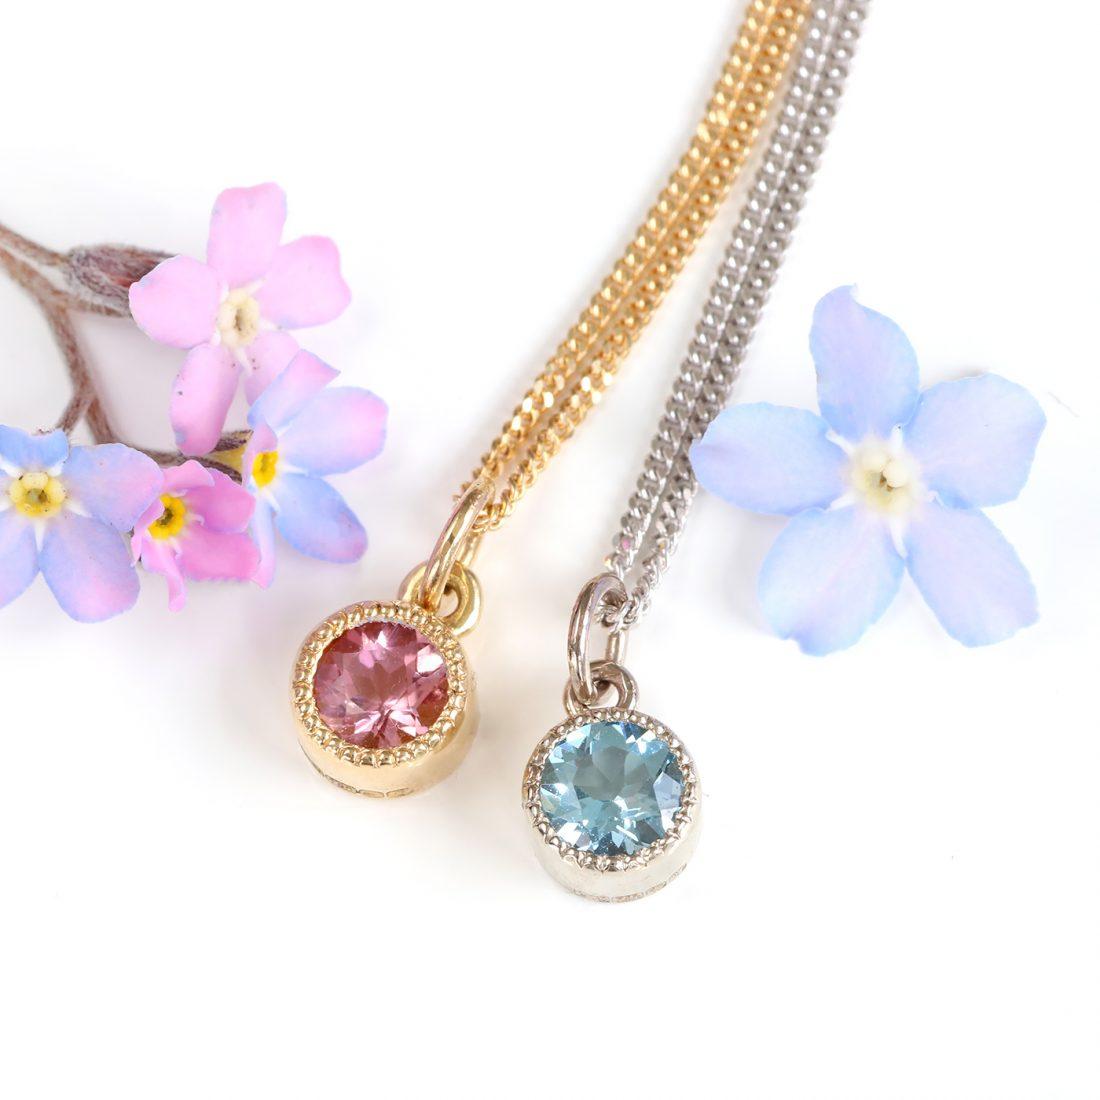 Lilia Nash Petite Millgrain Engraved Jewellery - Pendants